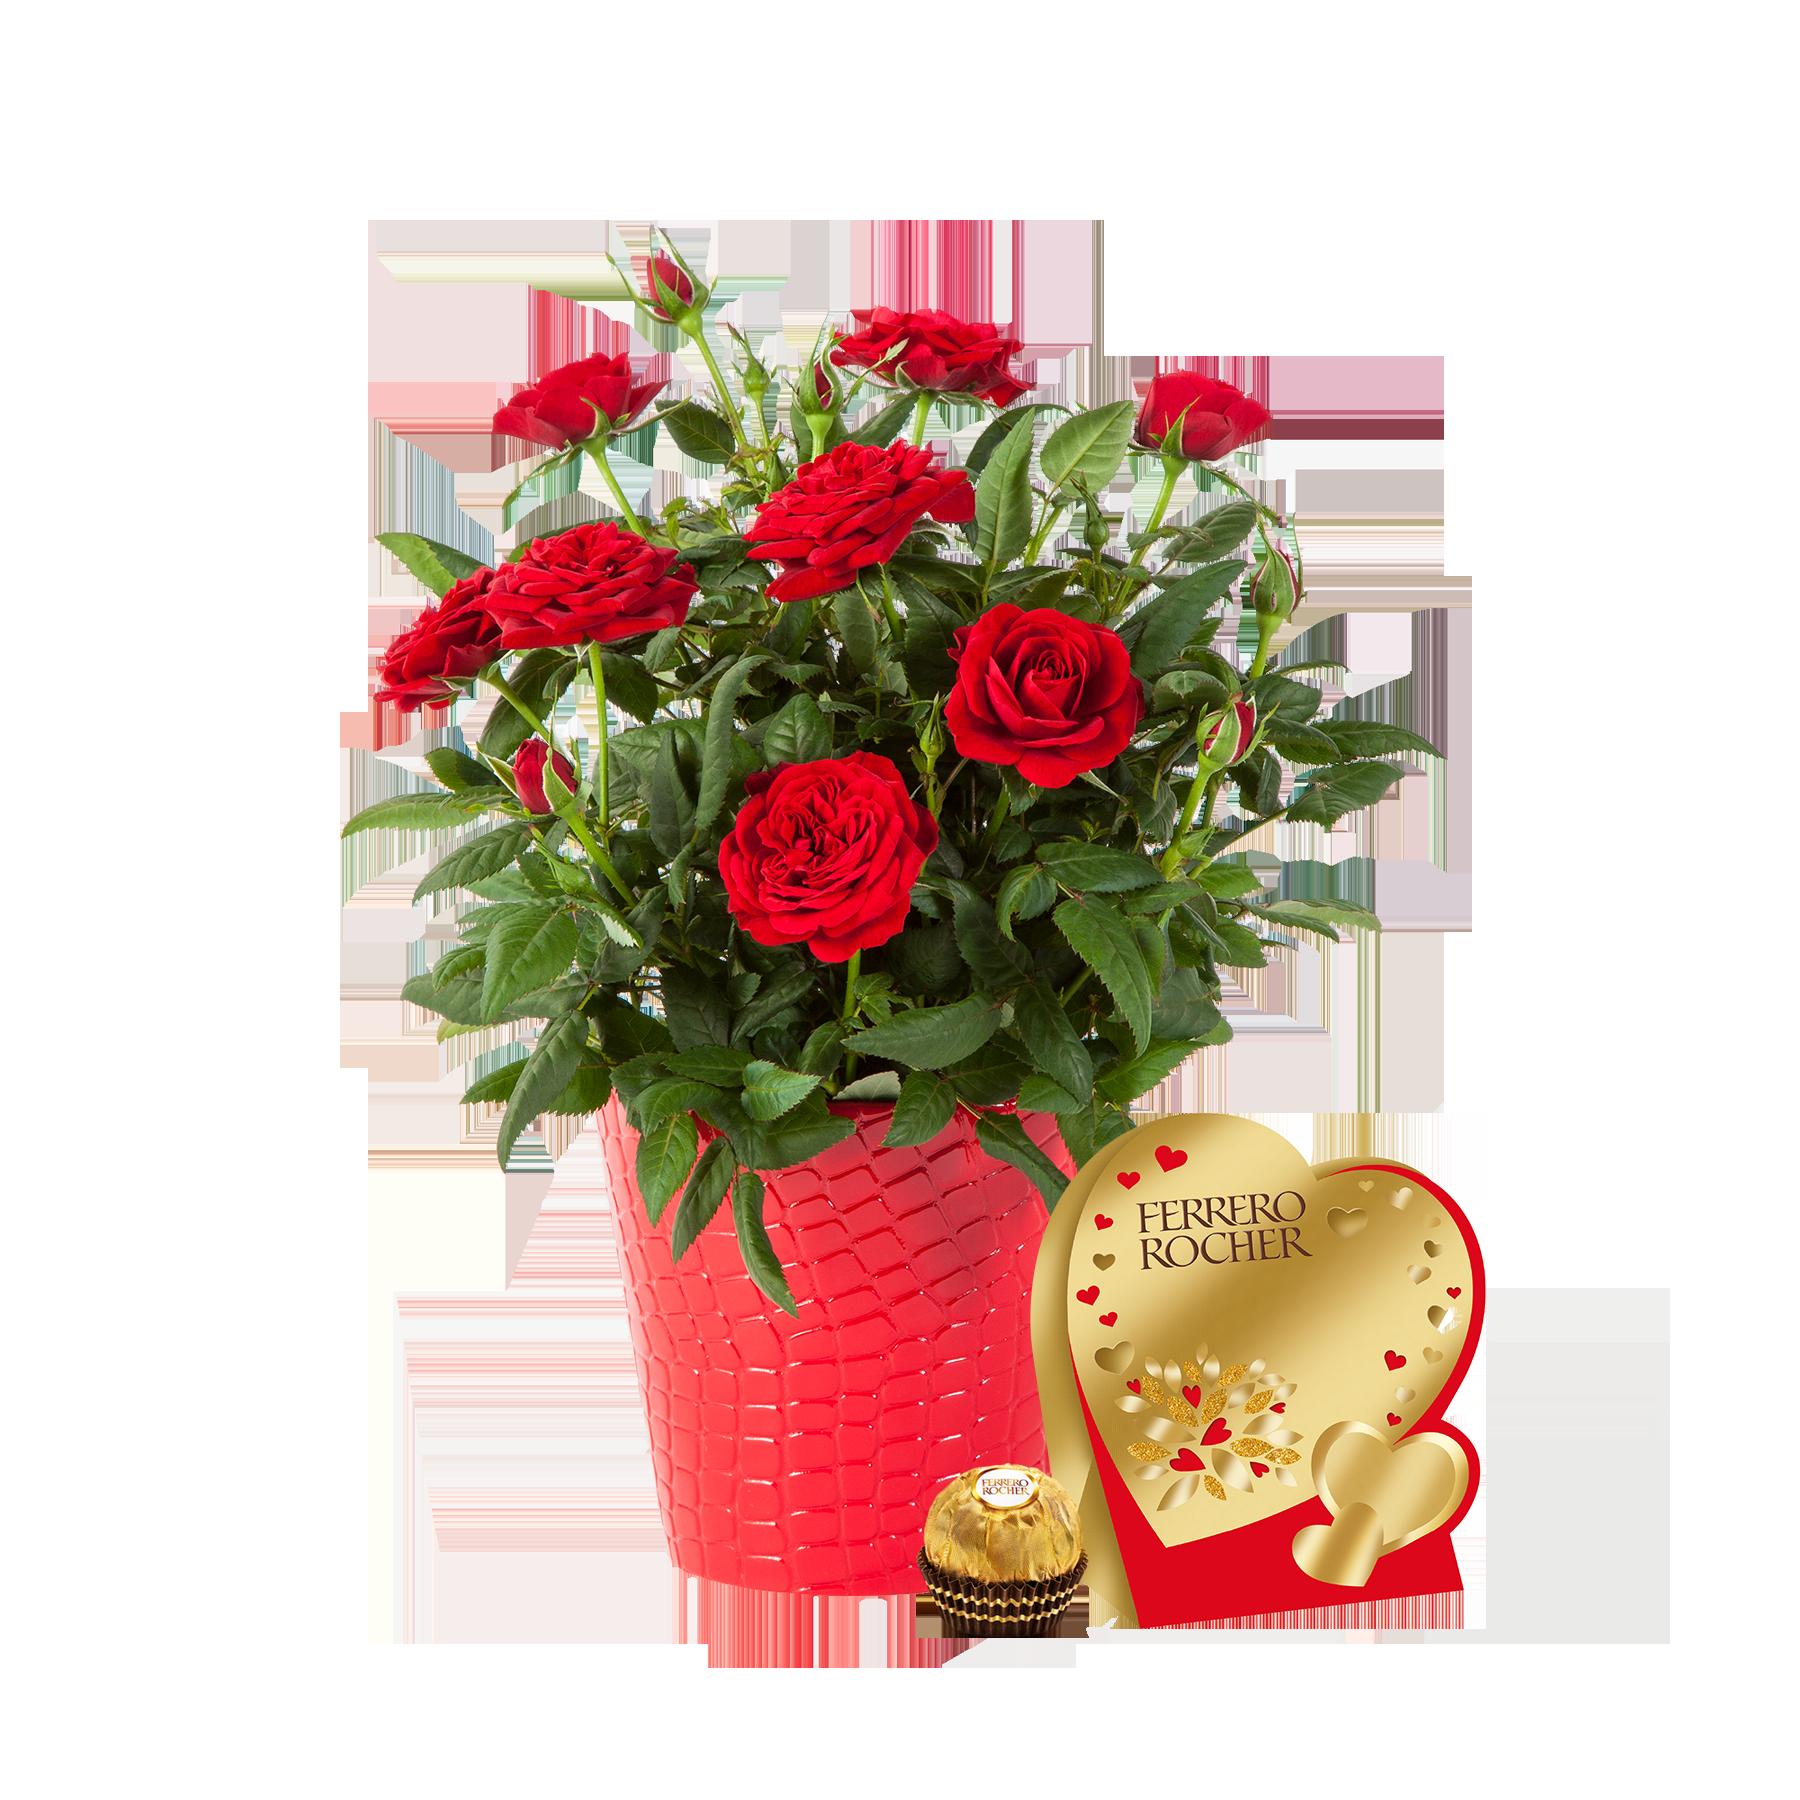 Topfrose in Rot mit Ferrero Rocher Herz